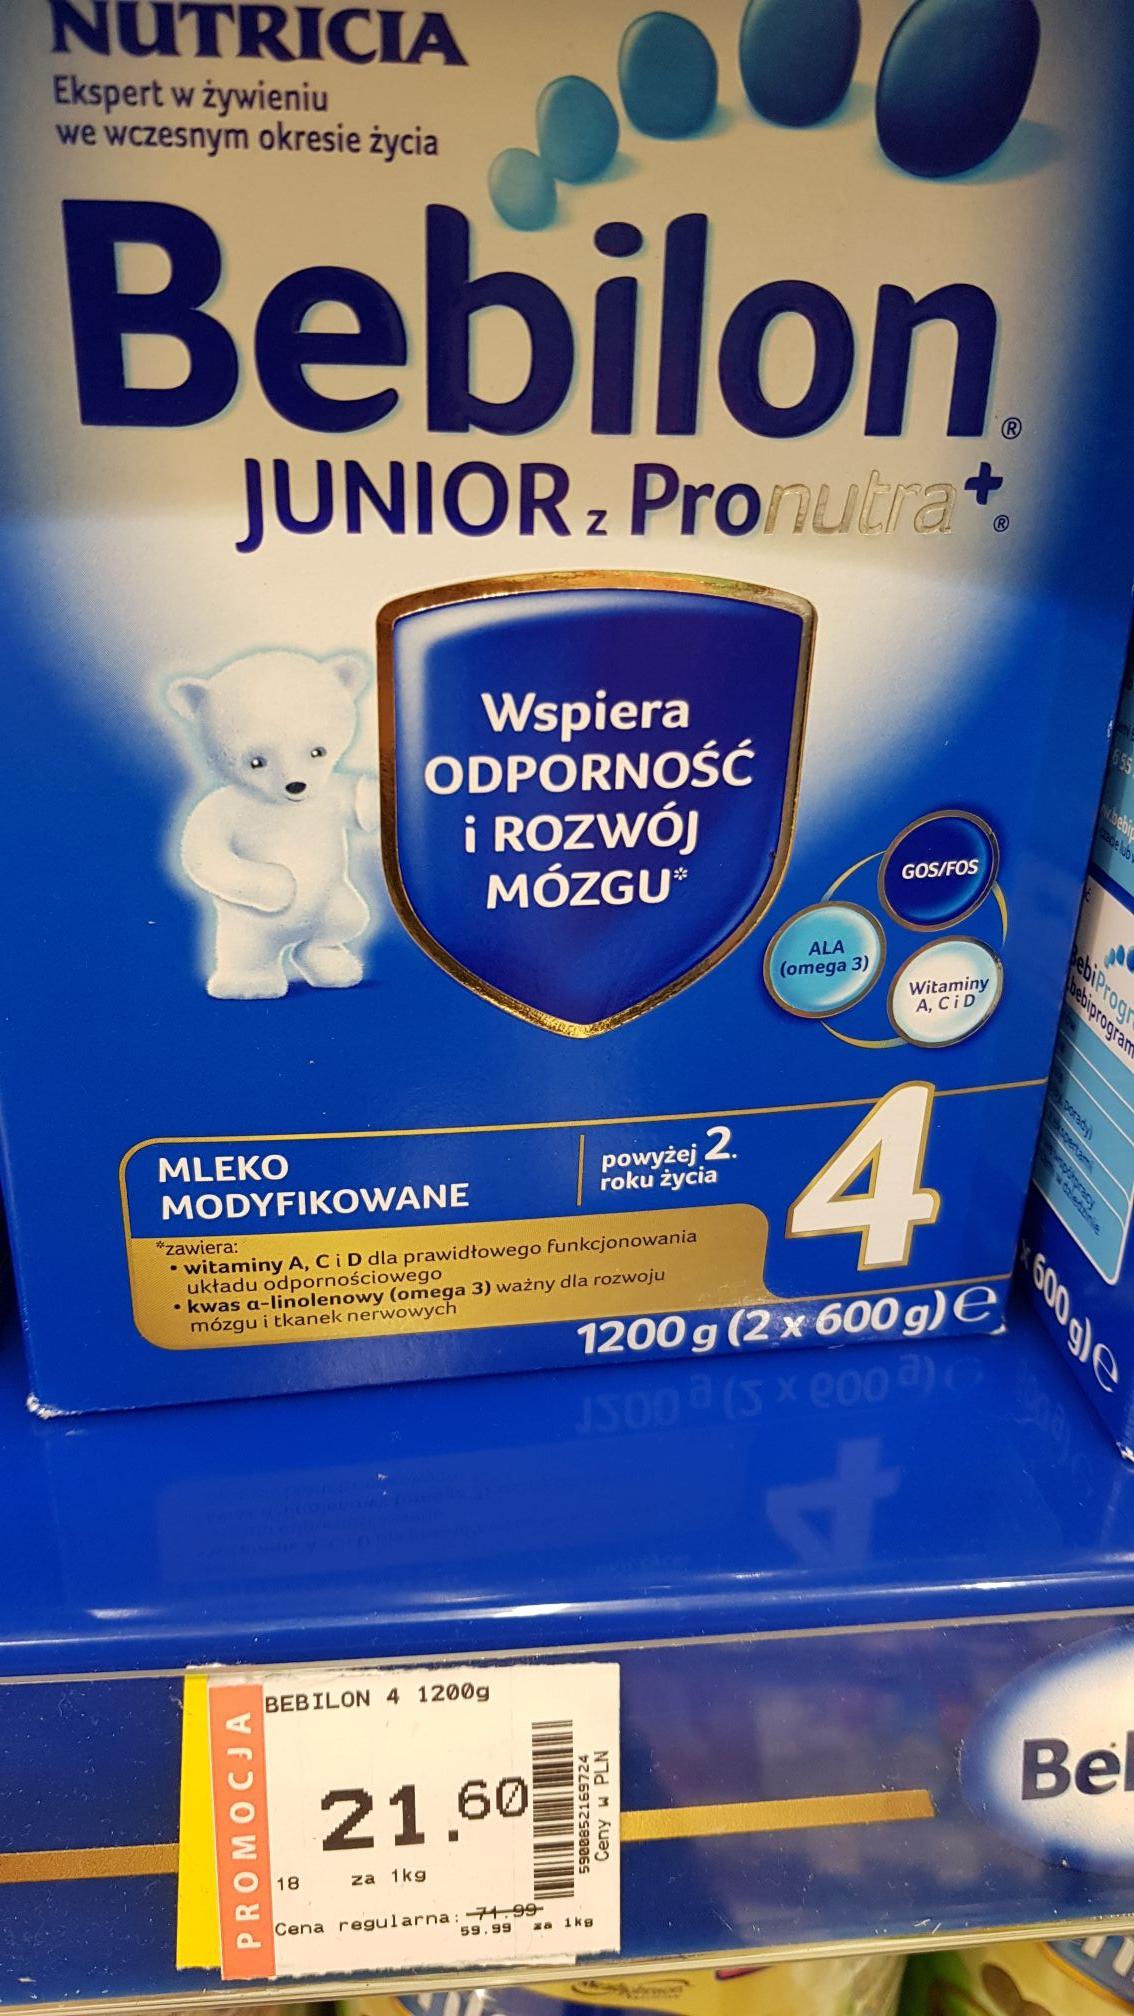 Bebilon Junior 4ka Superpharm Gliwice EC